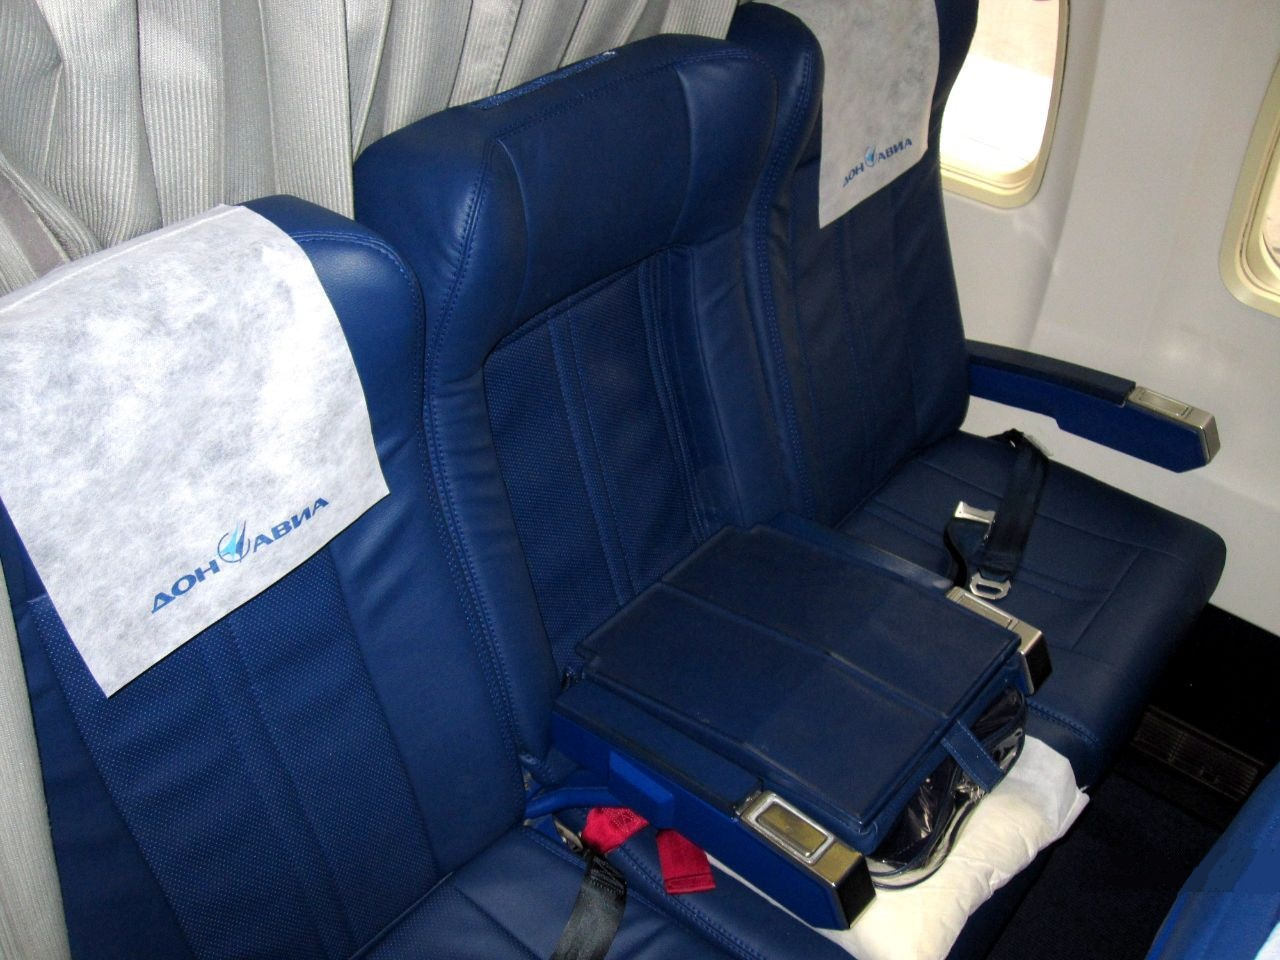 Кресла в бизнес-классе самолета Airbus A319 Донавиа